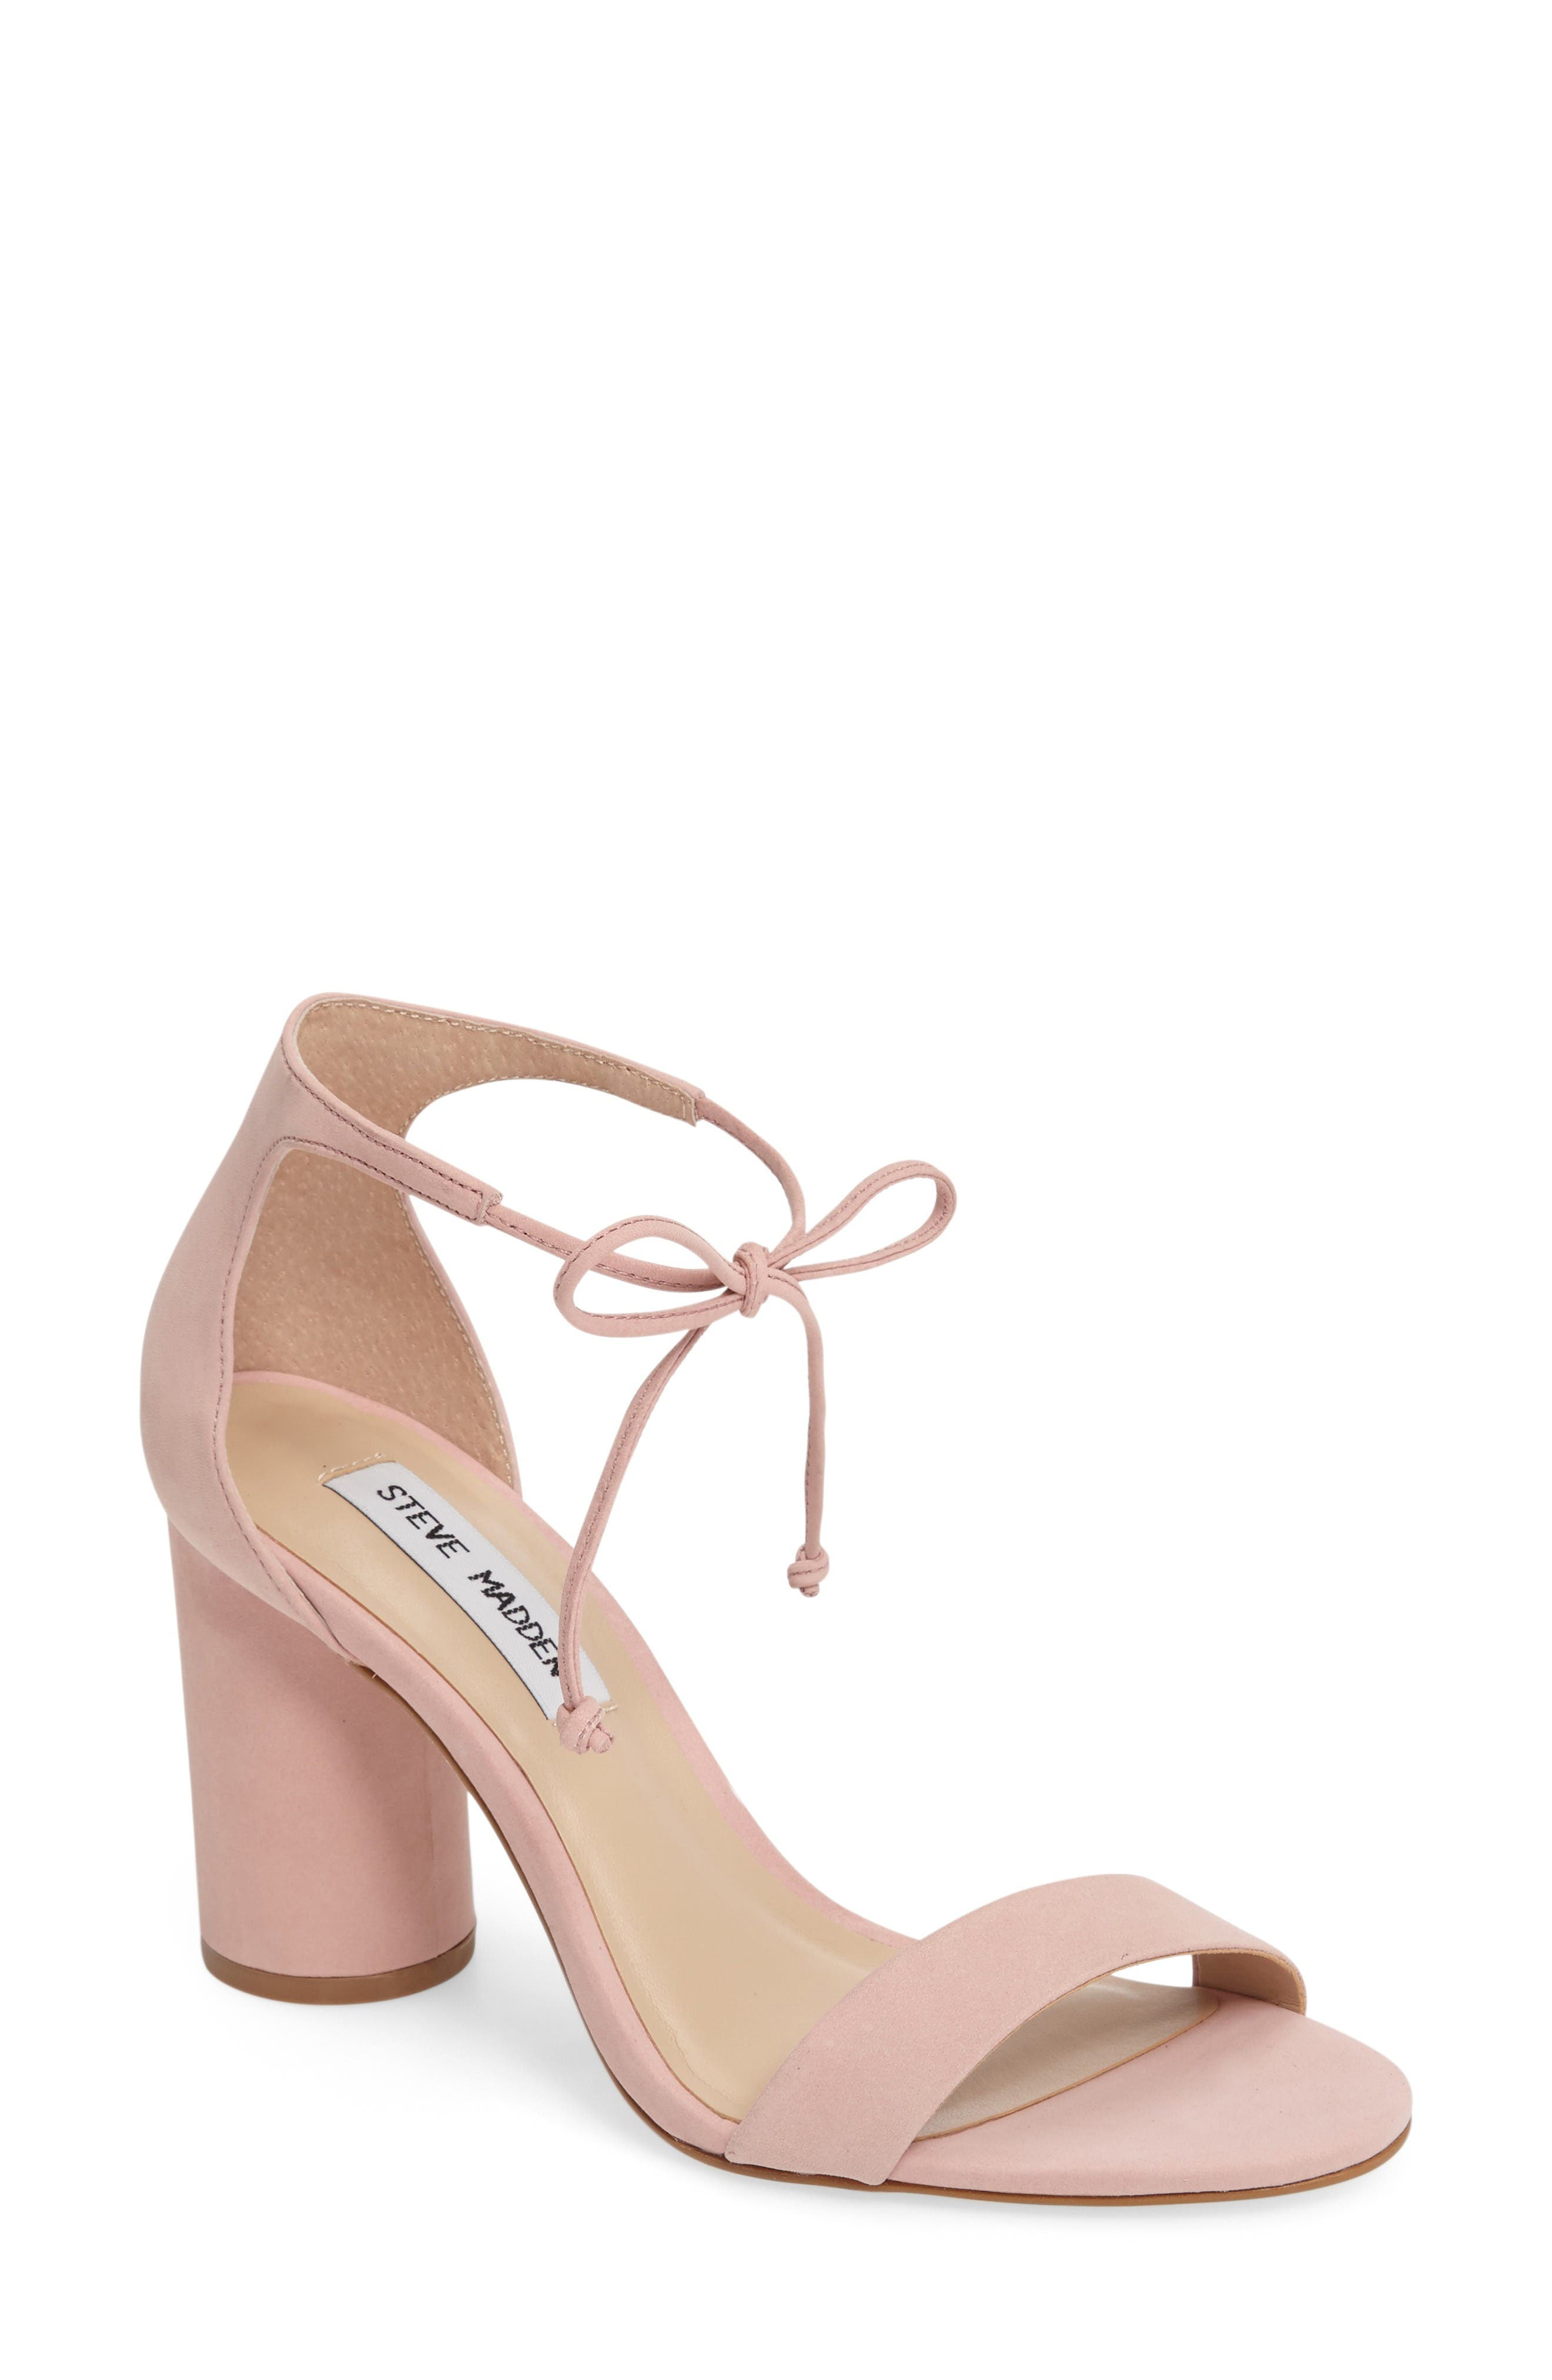 Main Image - Steve Madden Shays Lace-Up Sandal (Women)